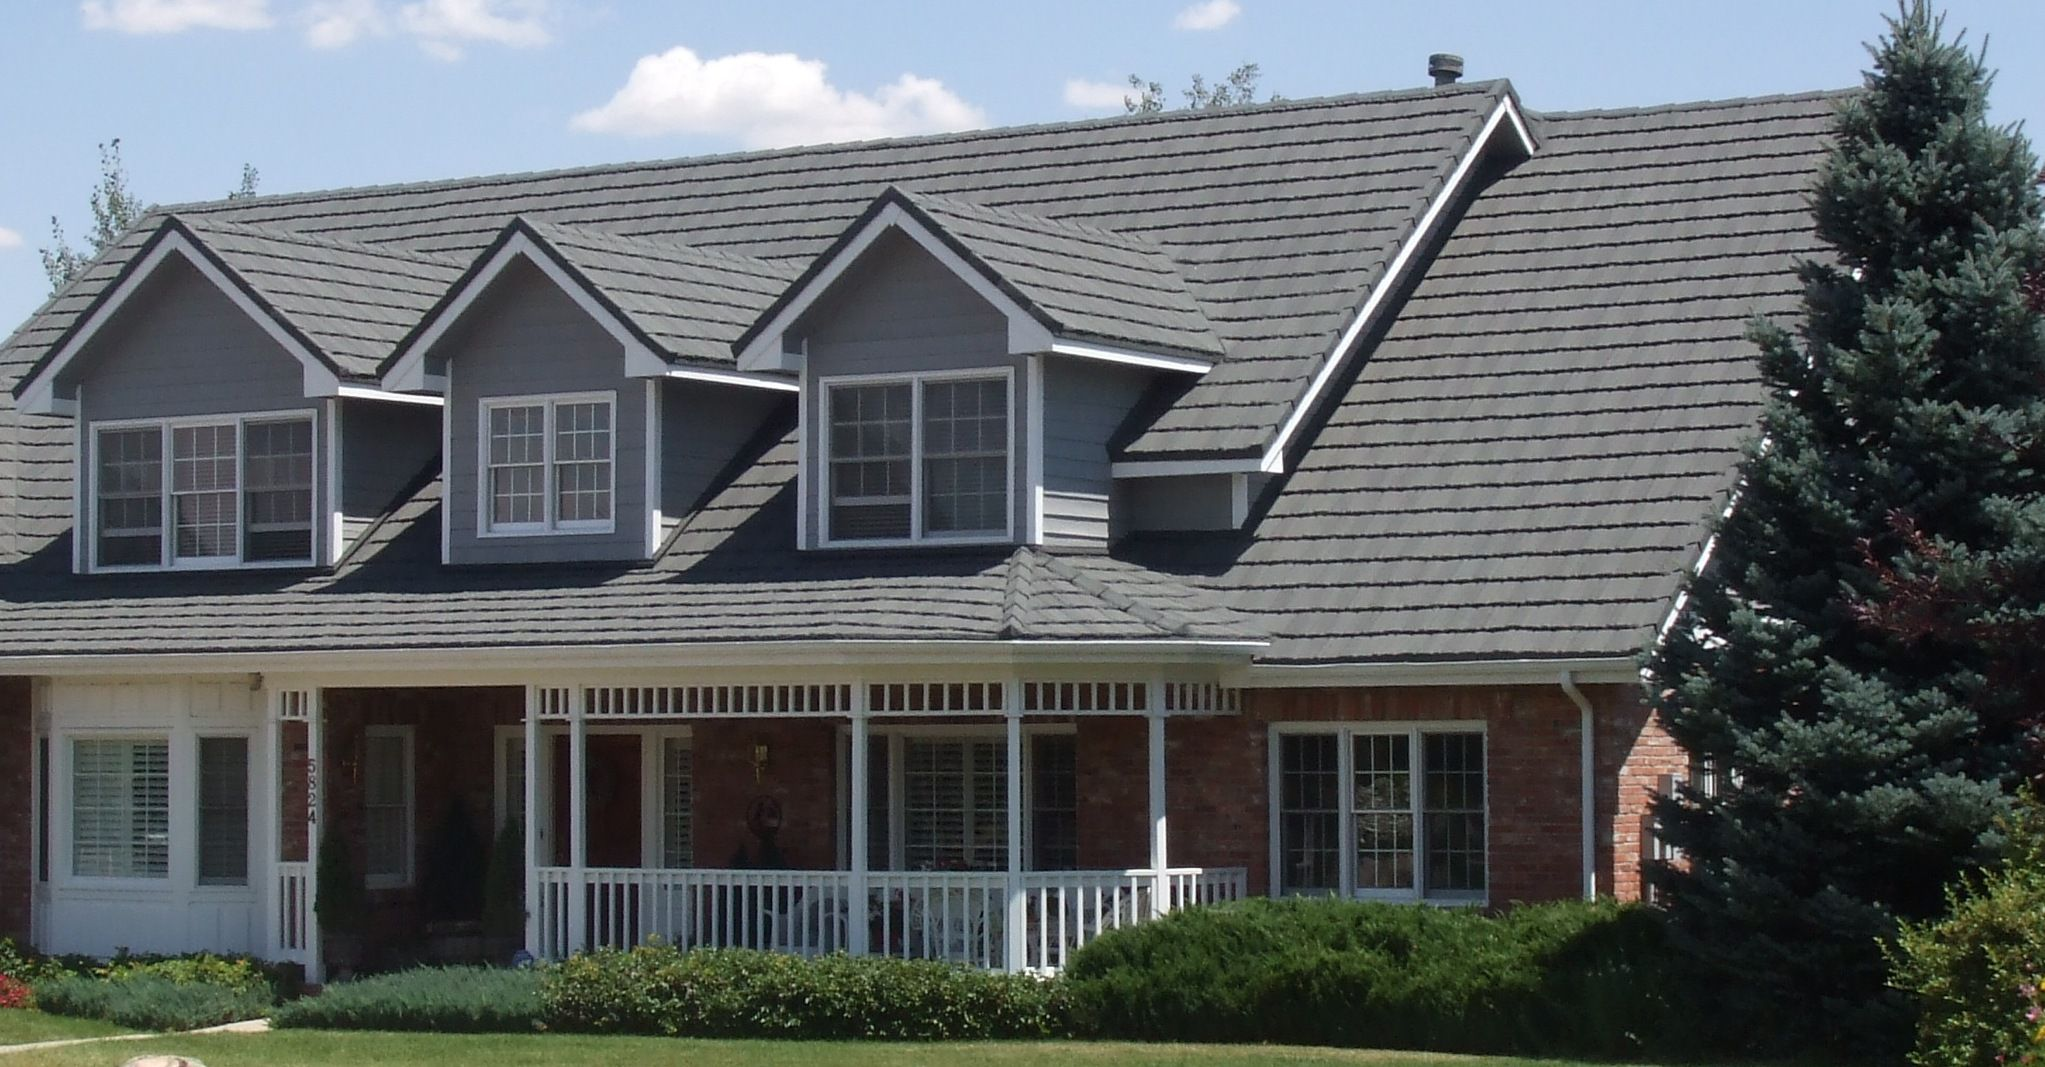 Lastime Roofing Omaha Nebraska Roofing company directory